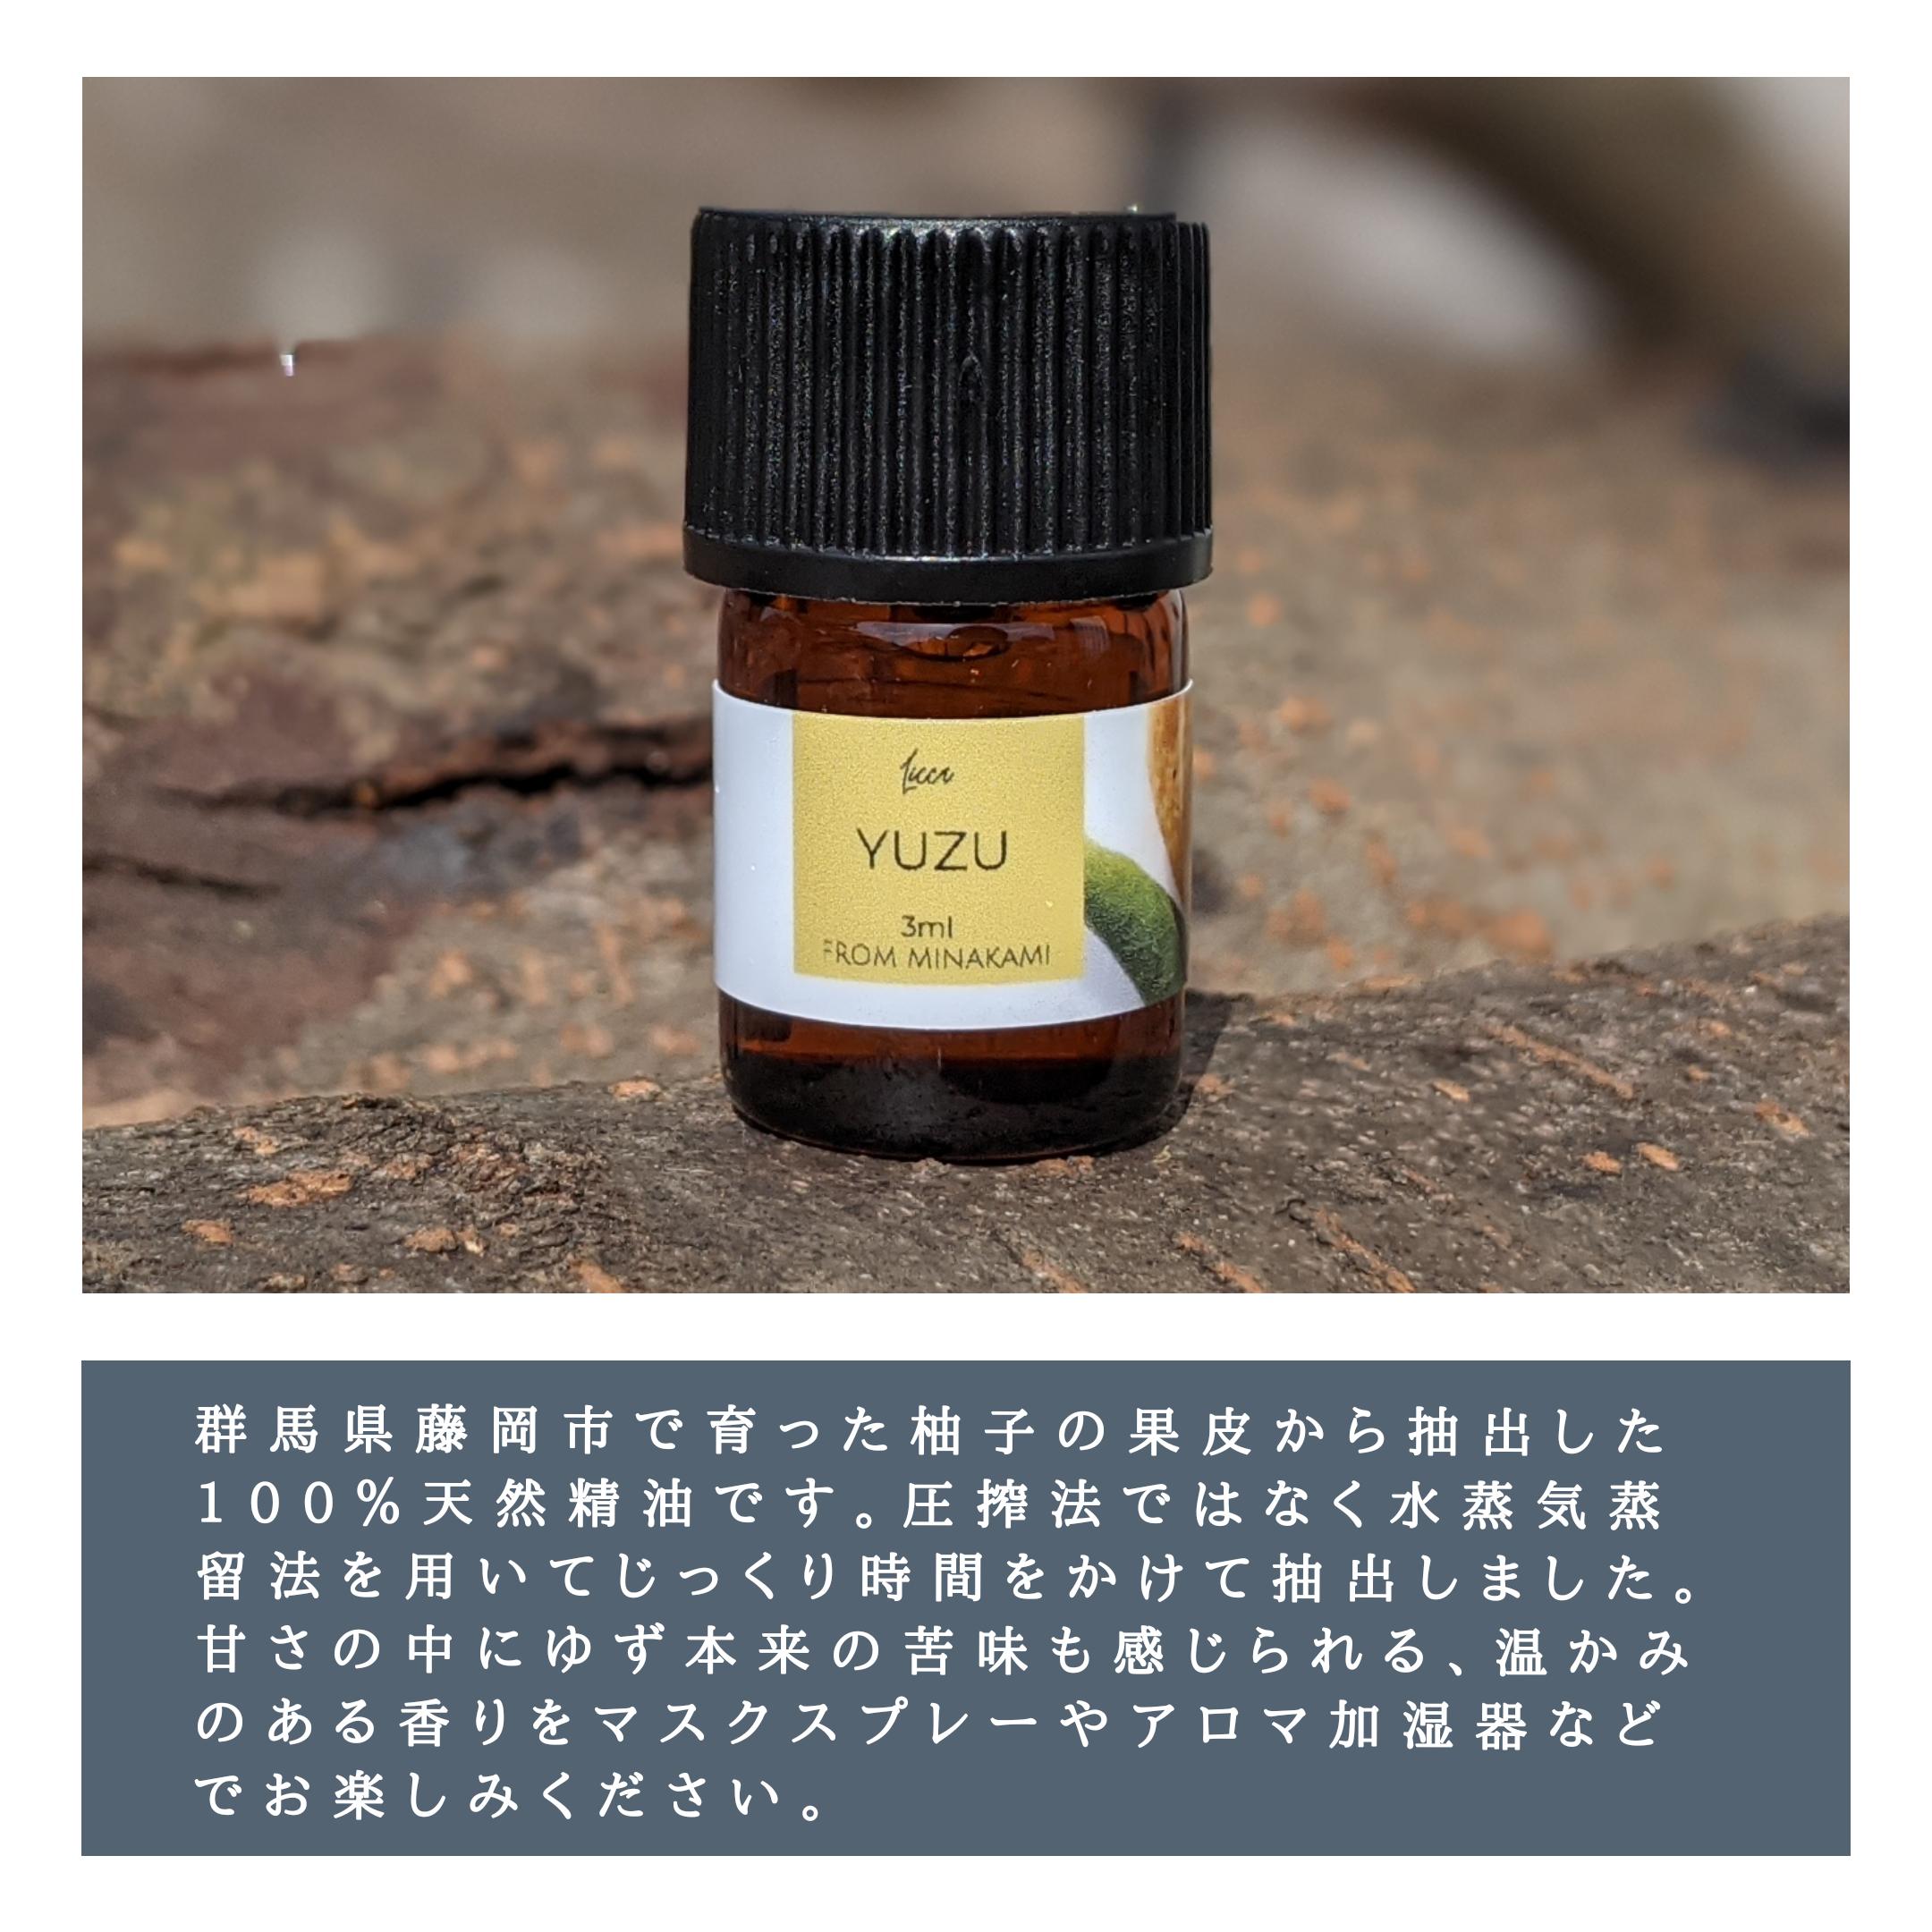 YUZU 【ユズ】エッセンシャルオイル 3ml